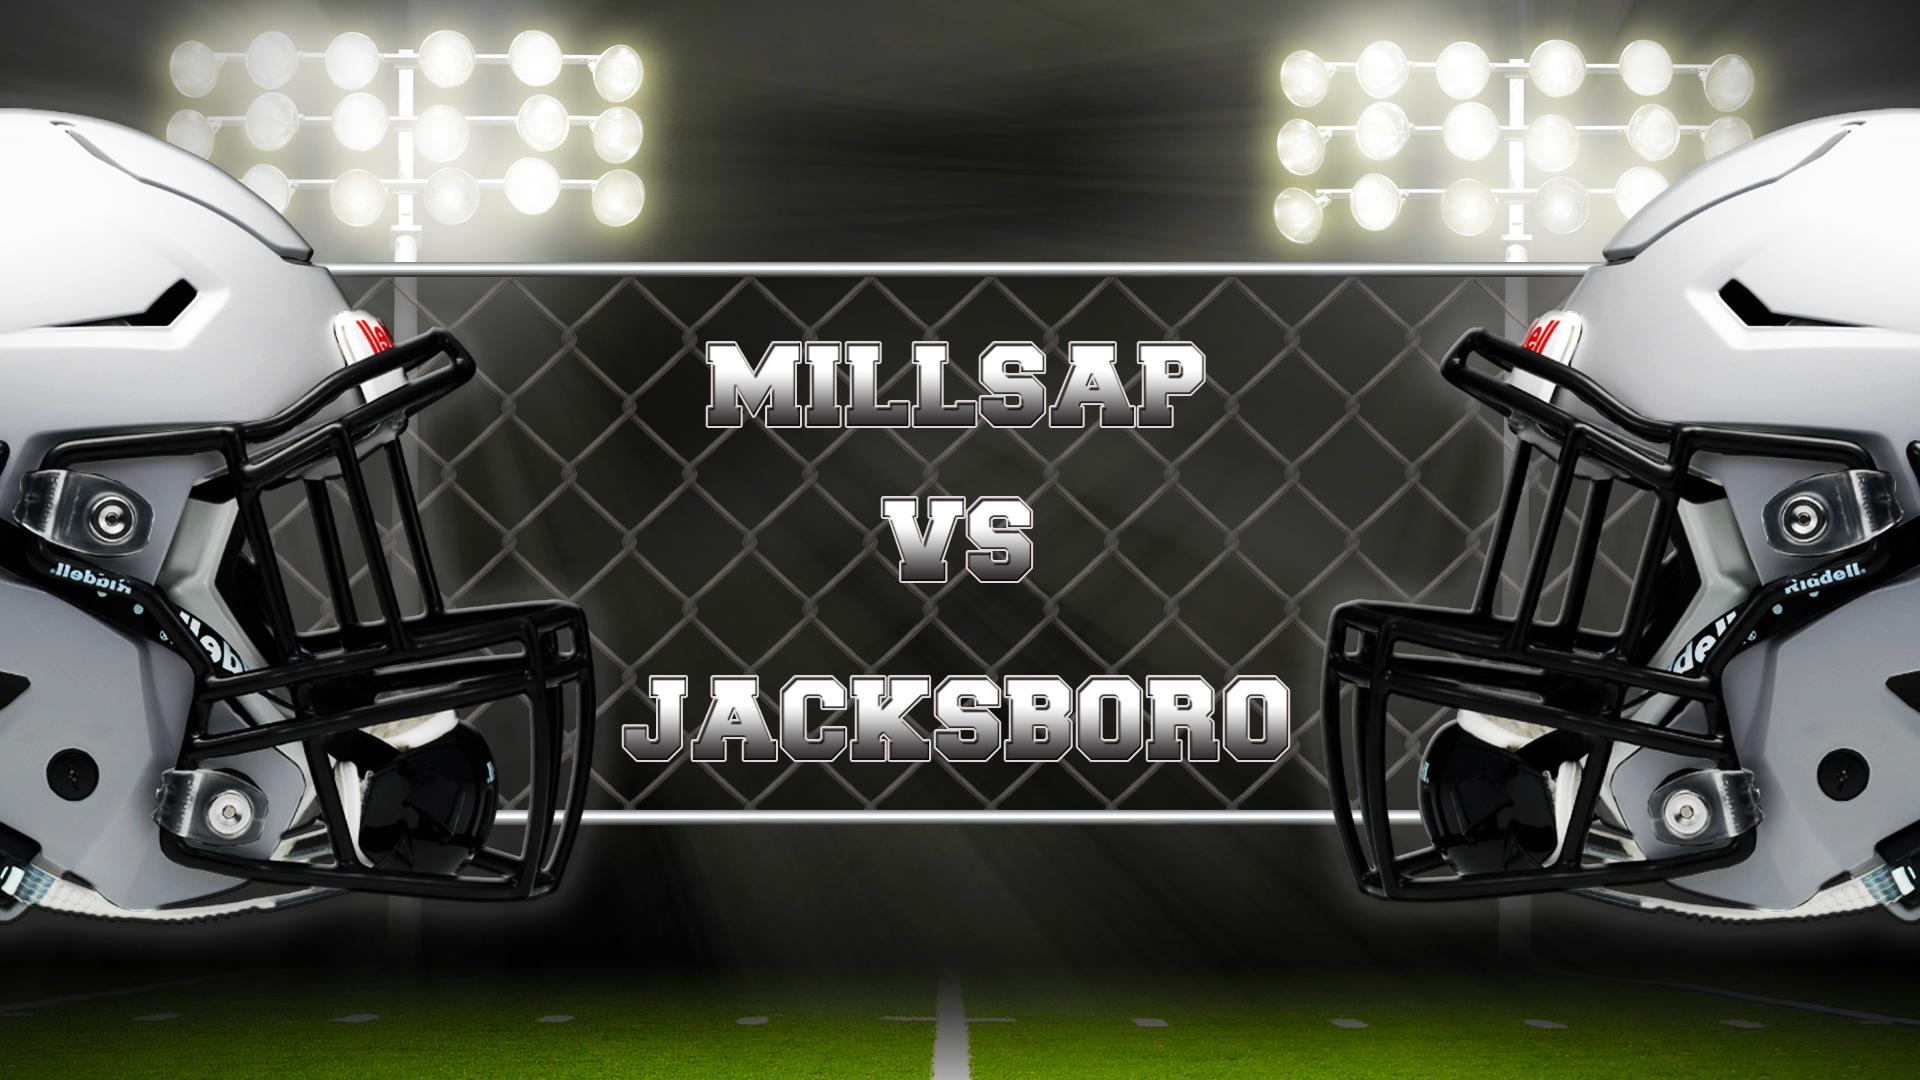 Millsap vs Jacksboro_1477073030163.jpg